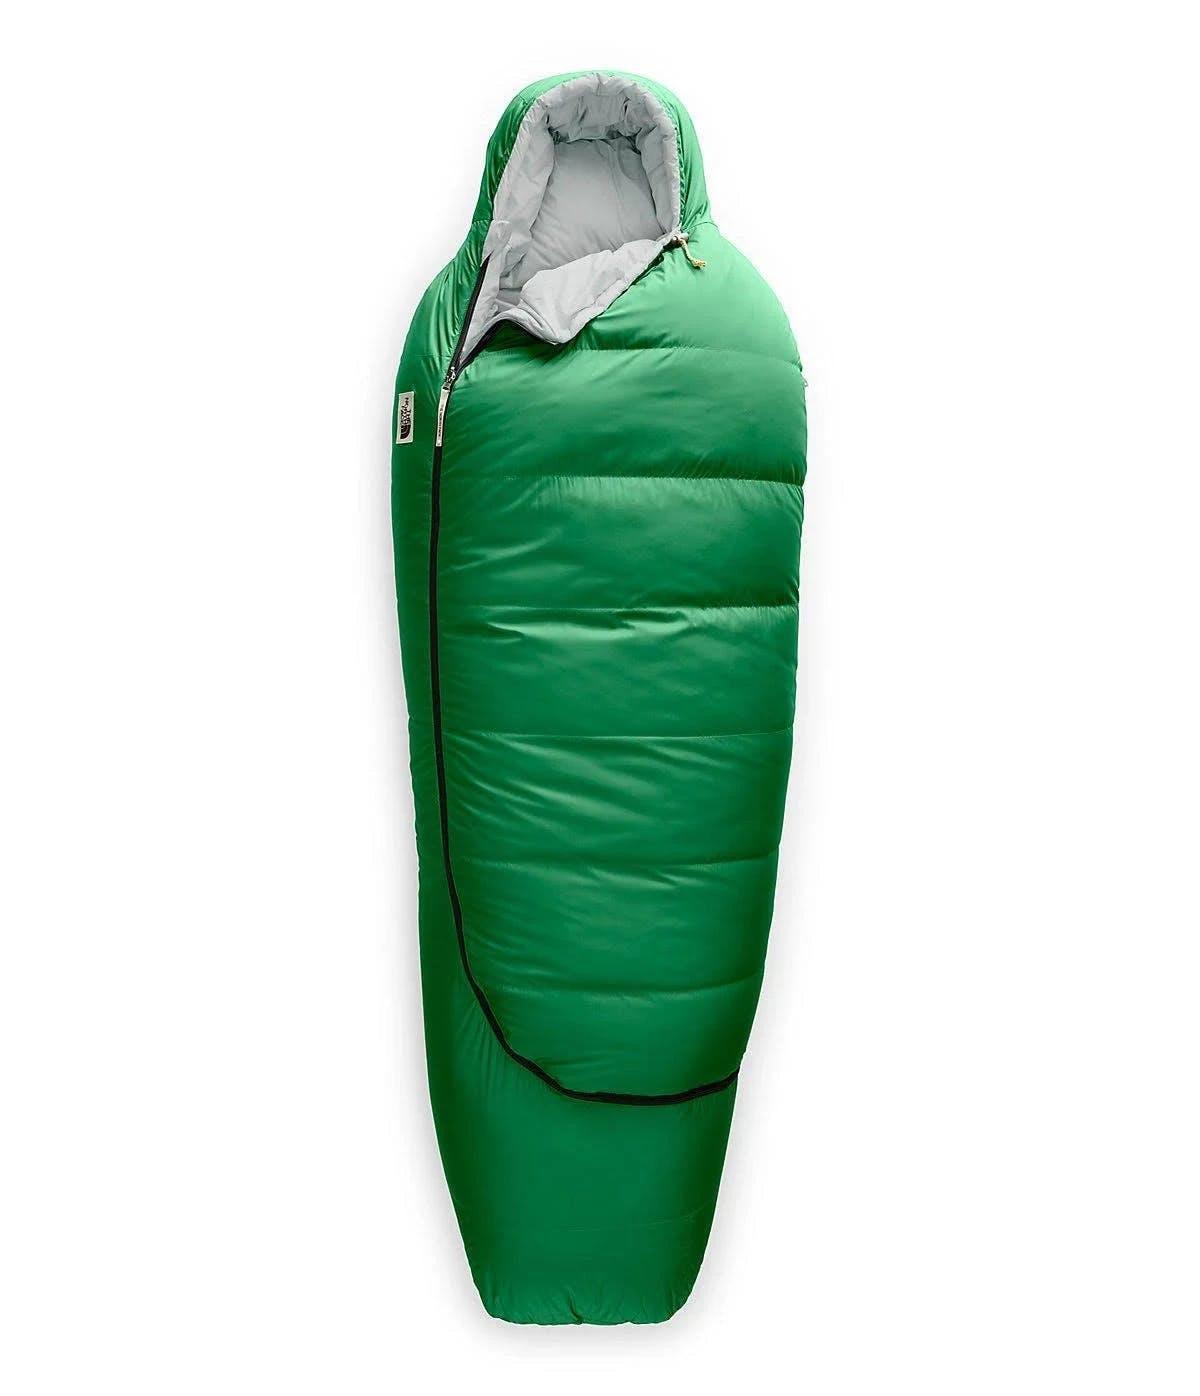 The North Face Eco Trail Down 0 Sleeping Bag: Sullivan Green